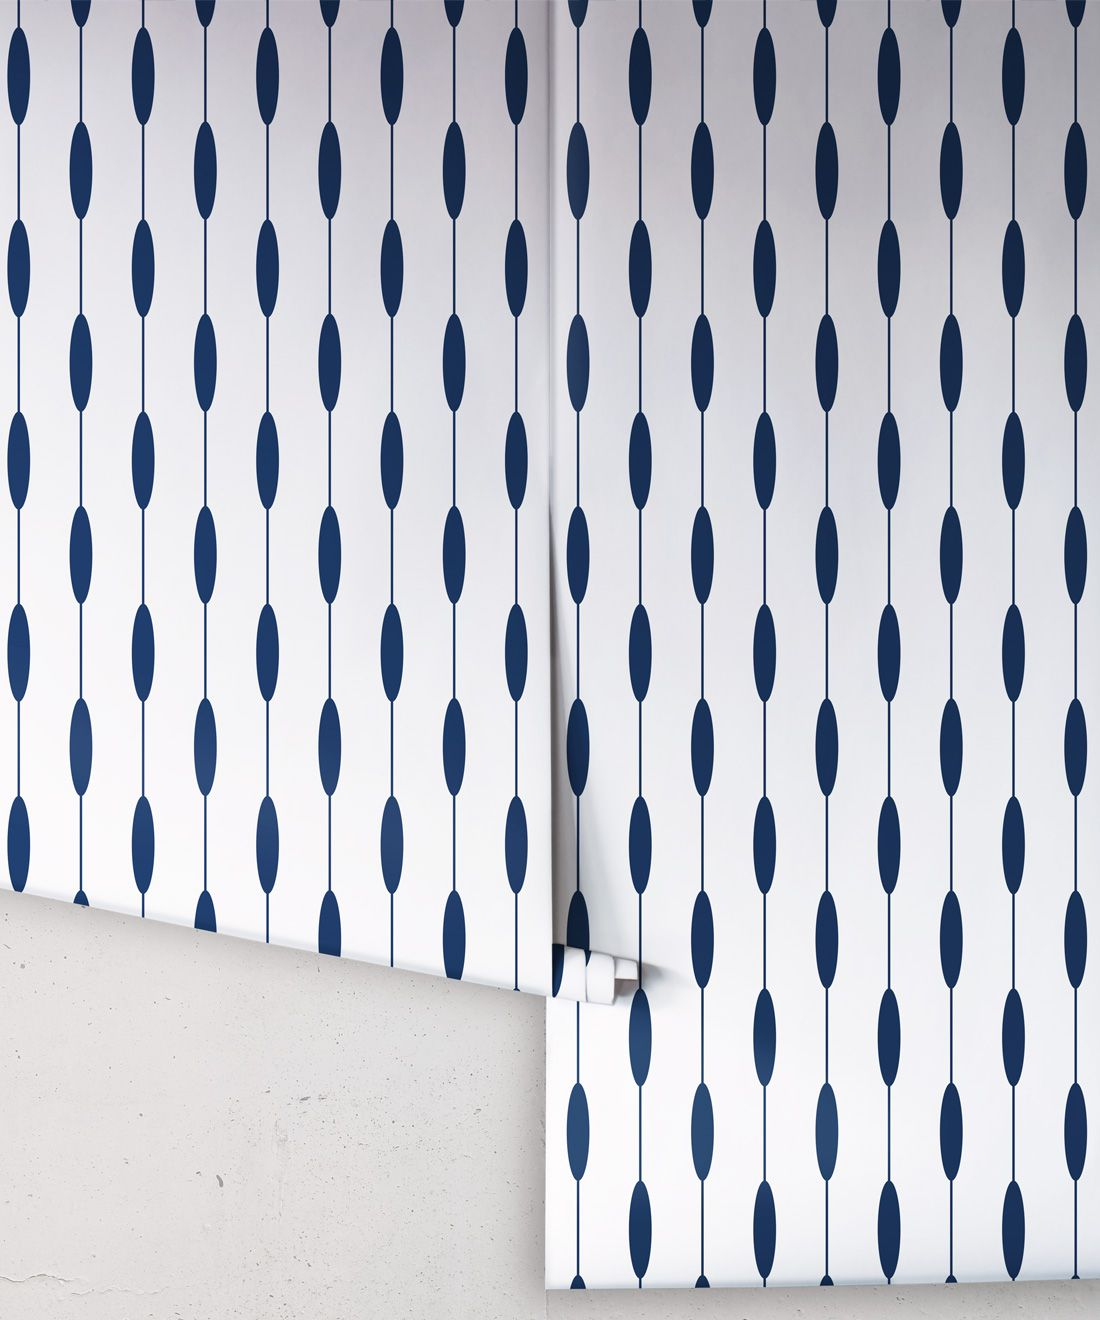 Bowline Wallpaper • Geometric Wallpaper • Striped Wallpaper • Navy Wallpaper •Rolls